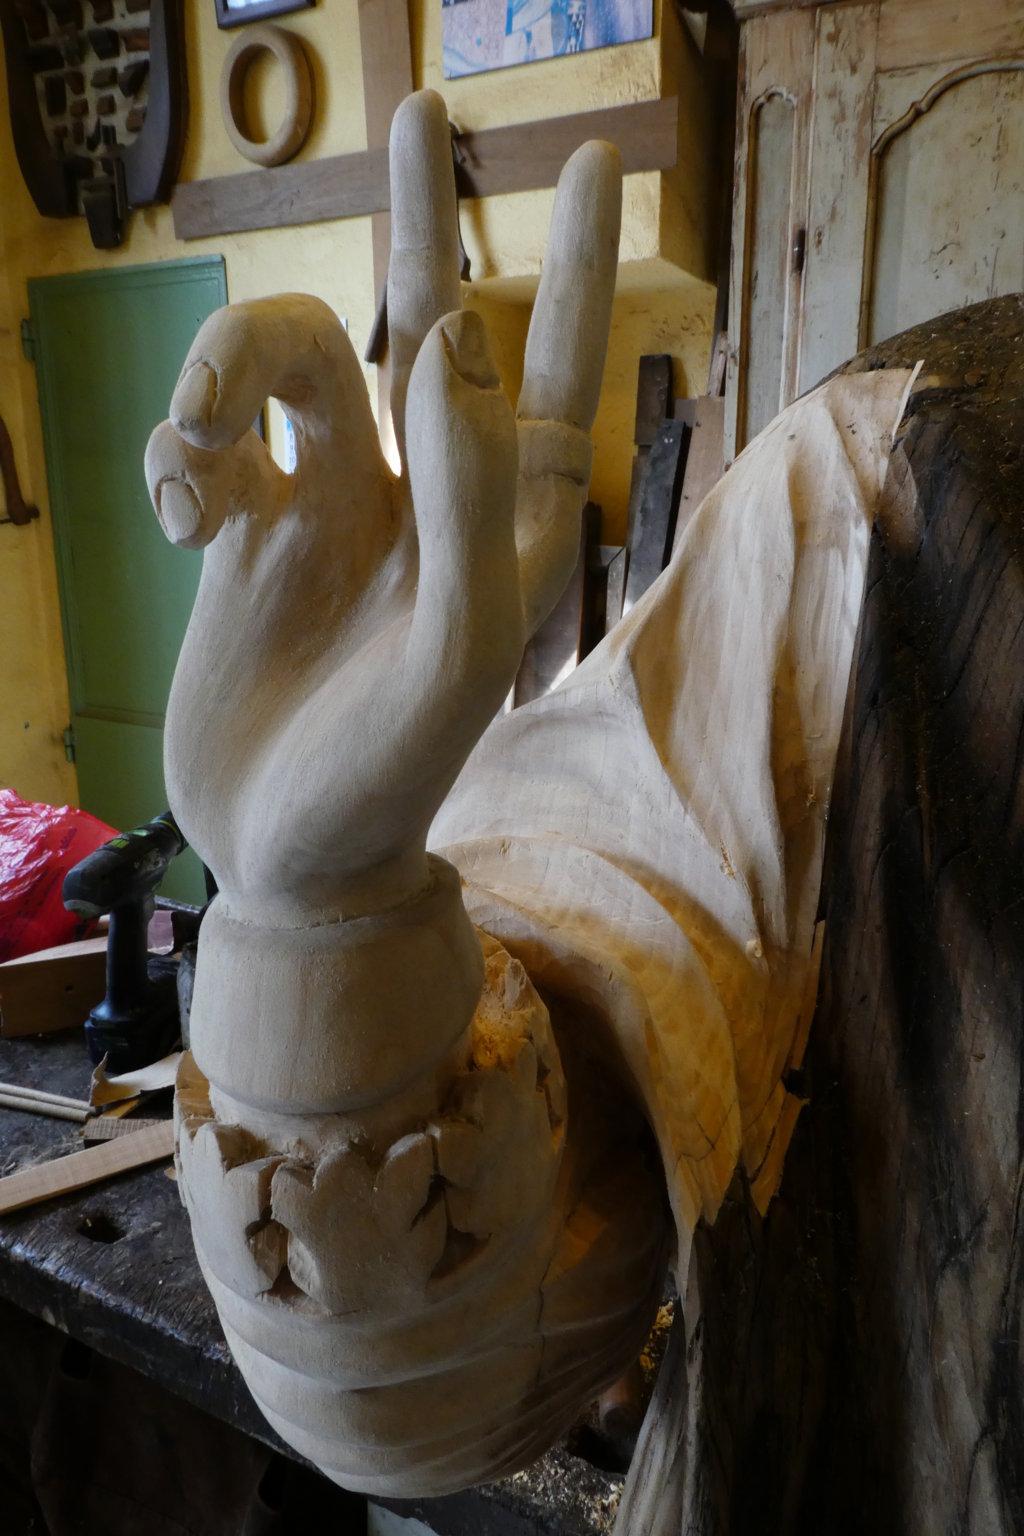 Braccio statua